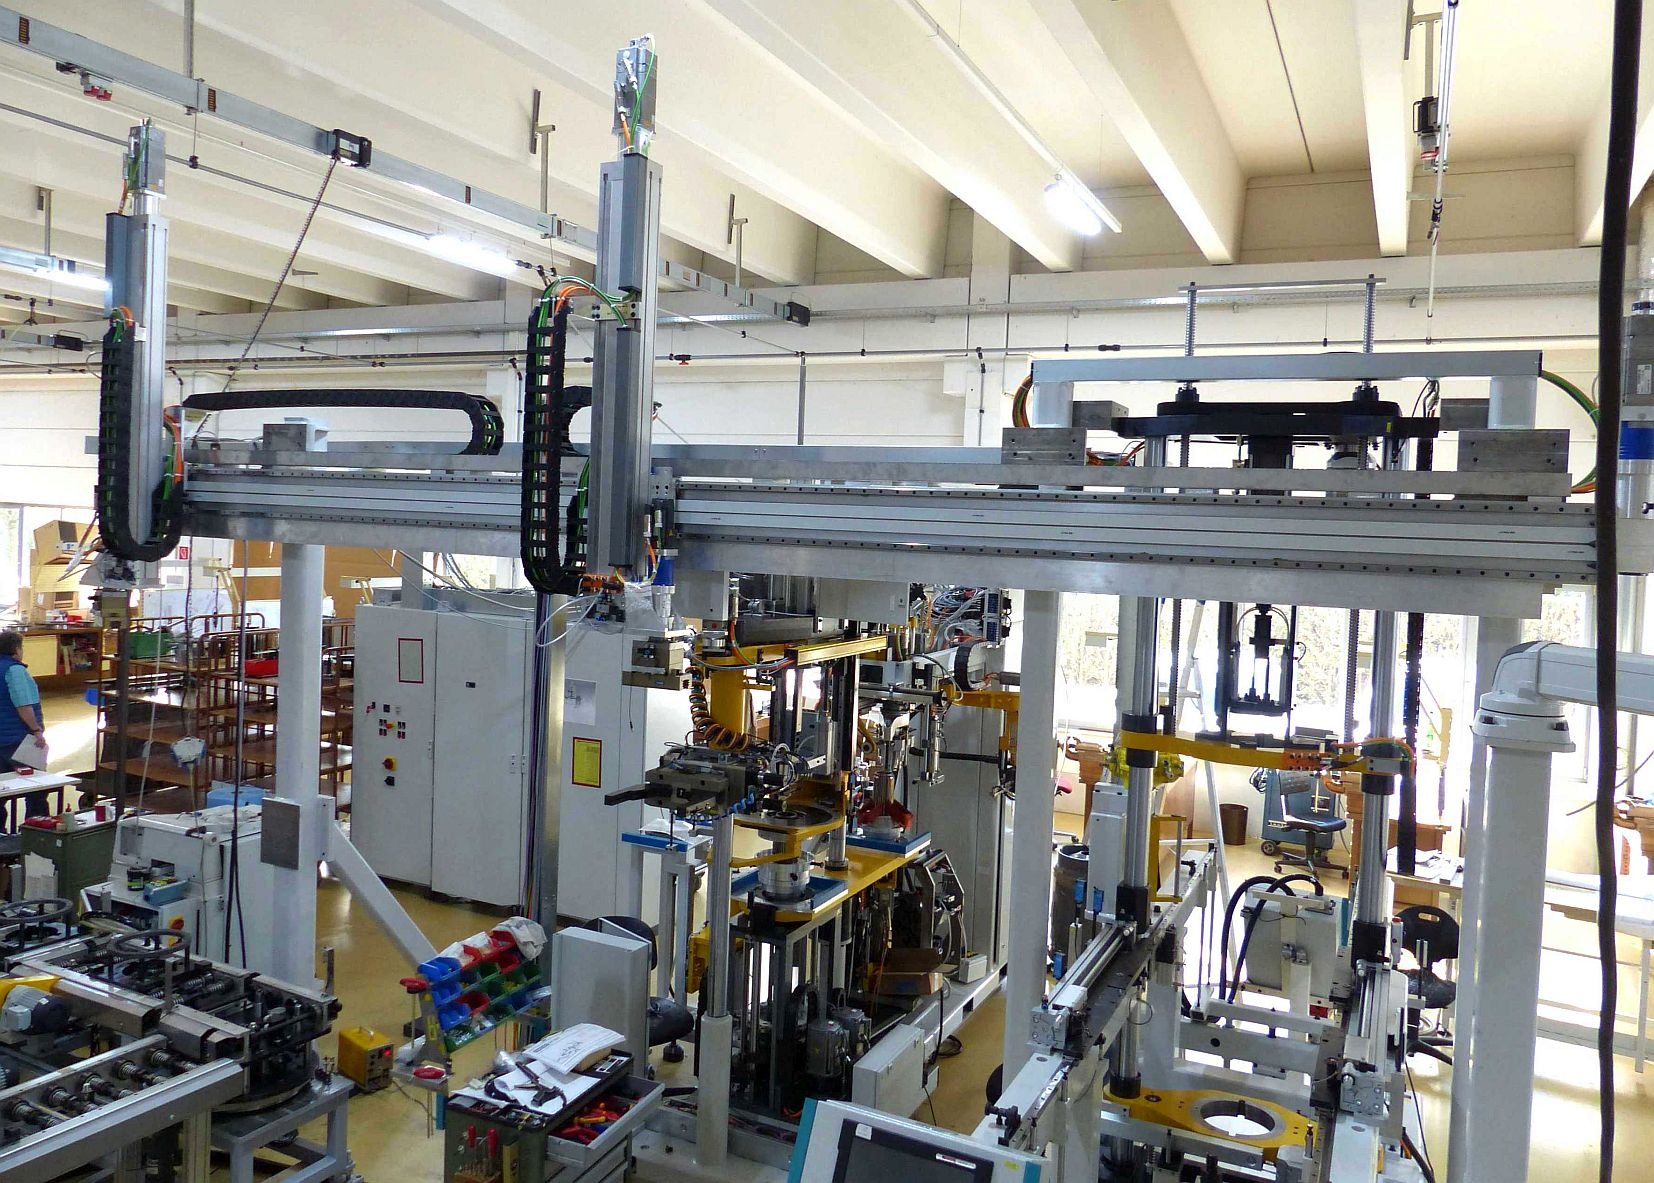 ANT nimmt neue Produktionshalle in Betrieb